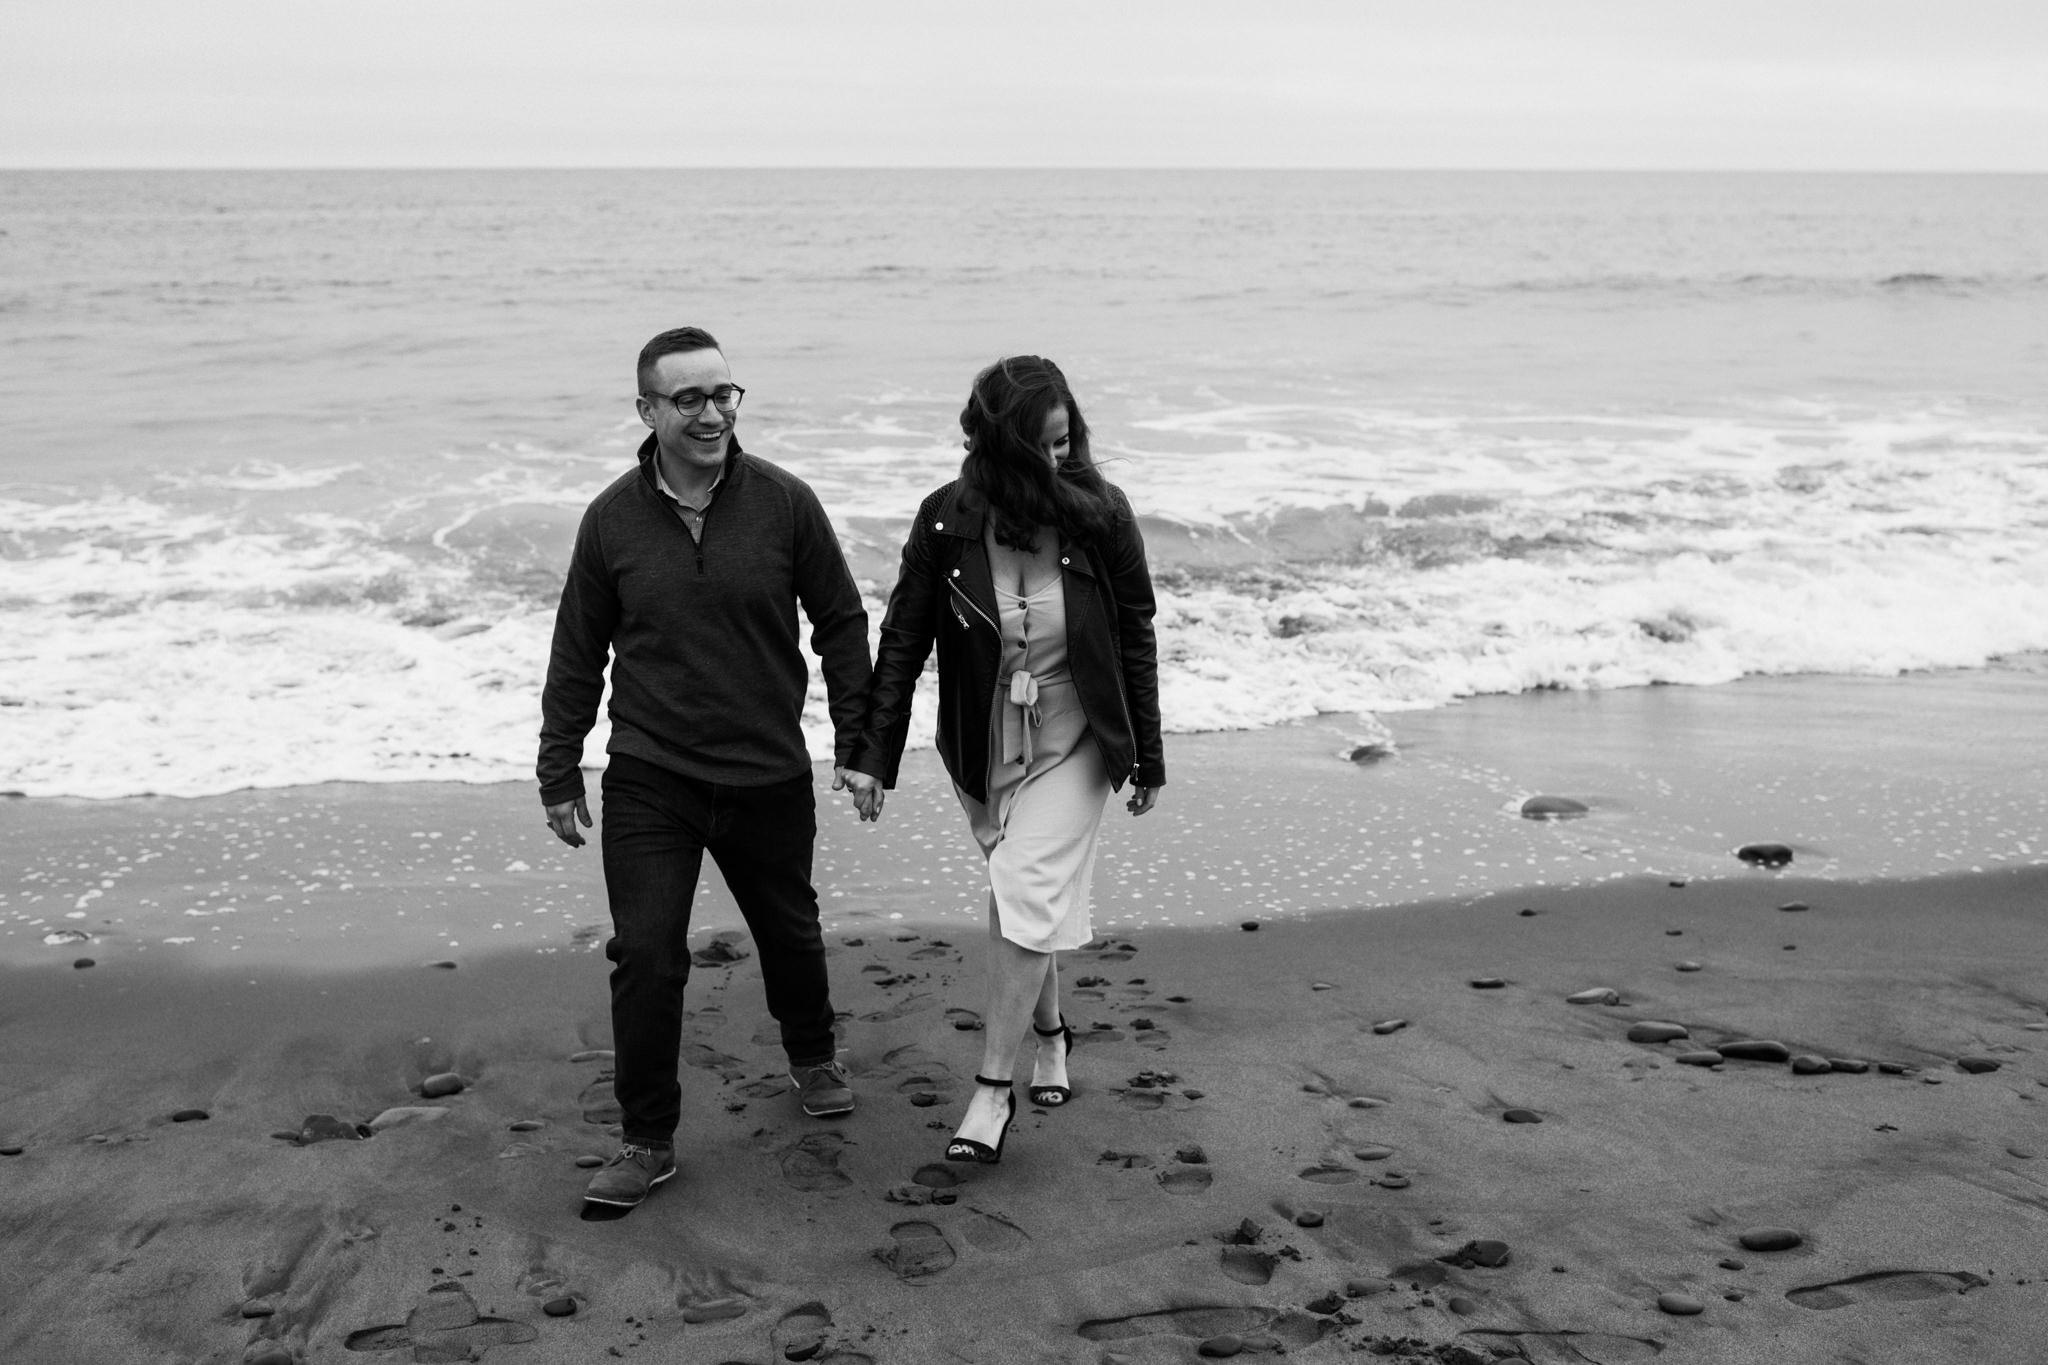 145-moody-lawrencetown-beach-nova-scotia-wedding-photographer-toronto.jpg